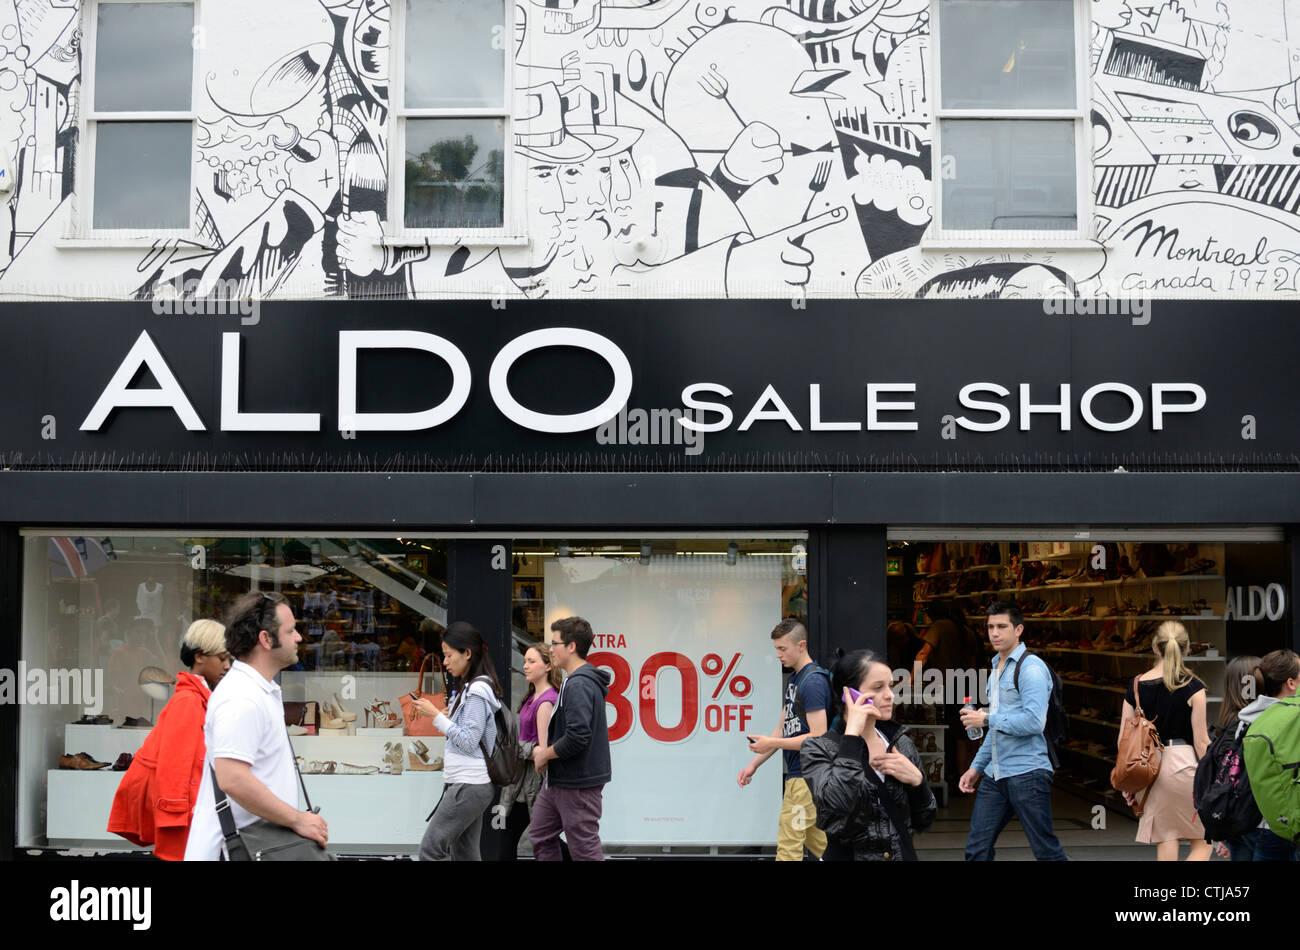 Aldo Sale Shop, Camden Town, London, UK